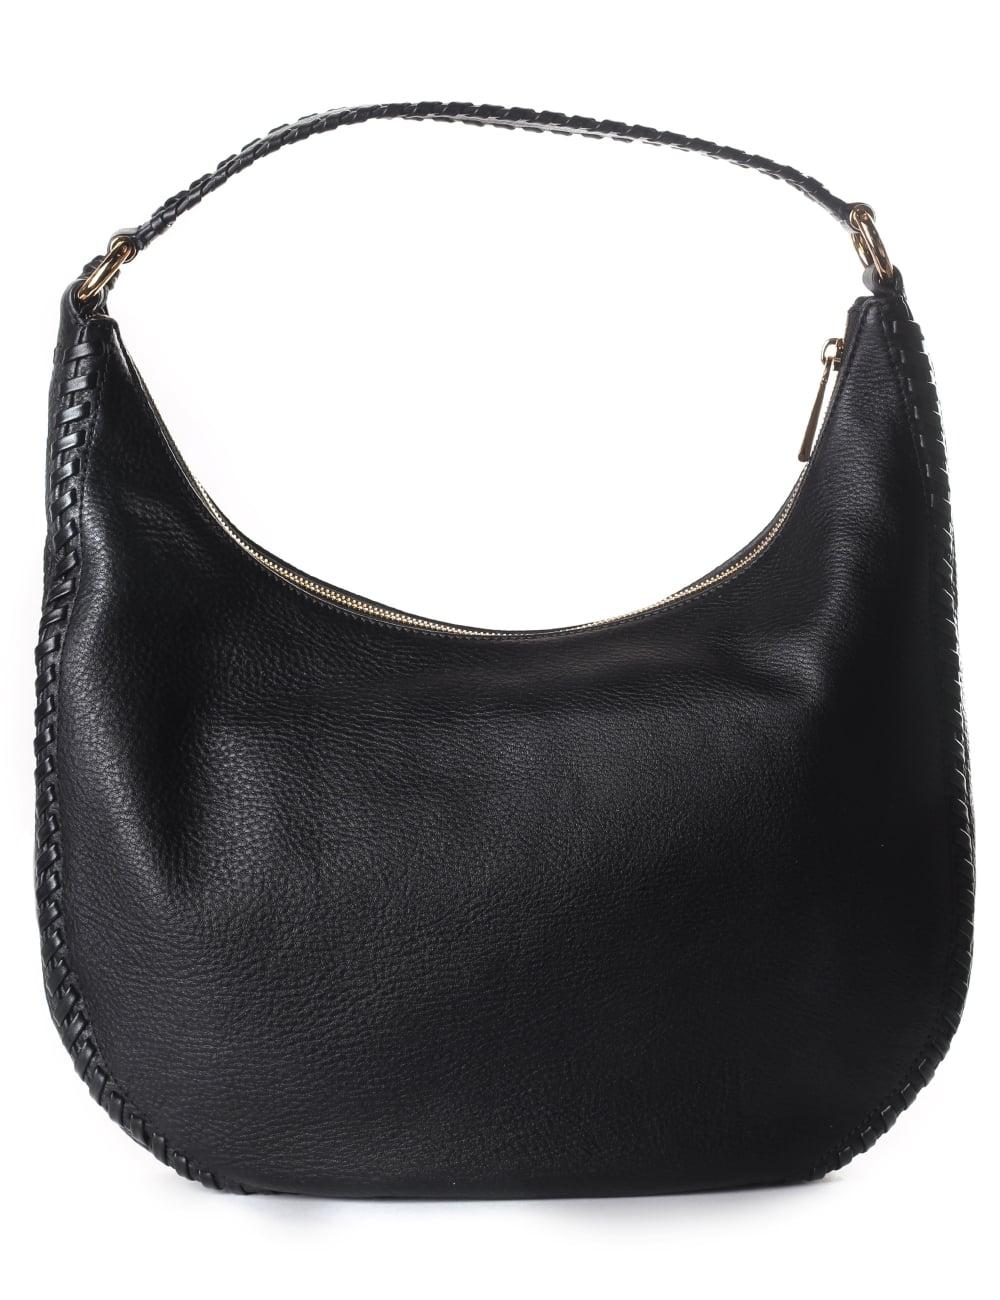 0e176e2edb617 Michael Kors Women s Lauryn Shoulder Bag Black